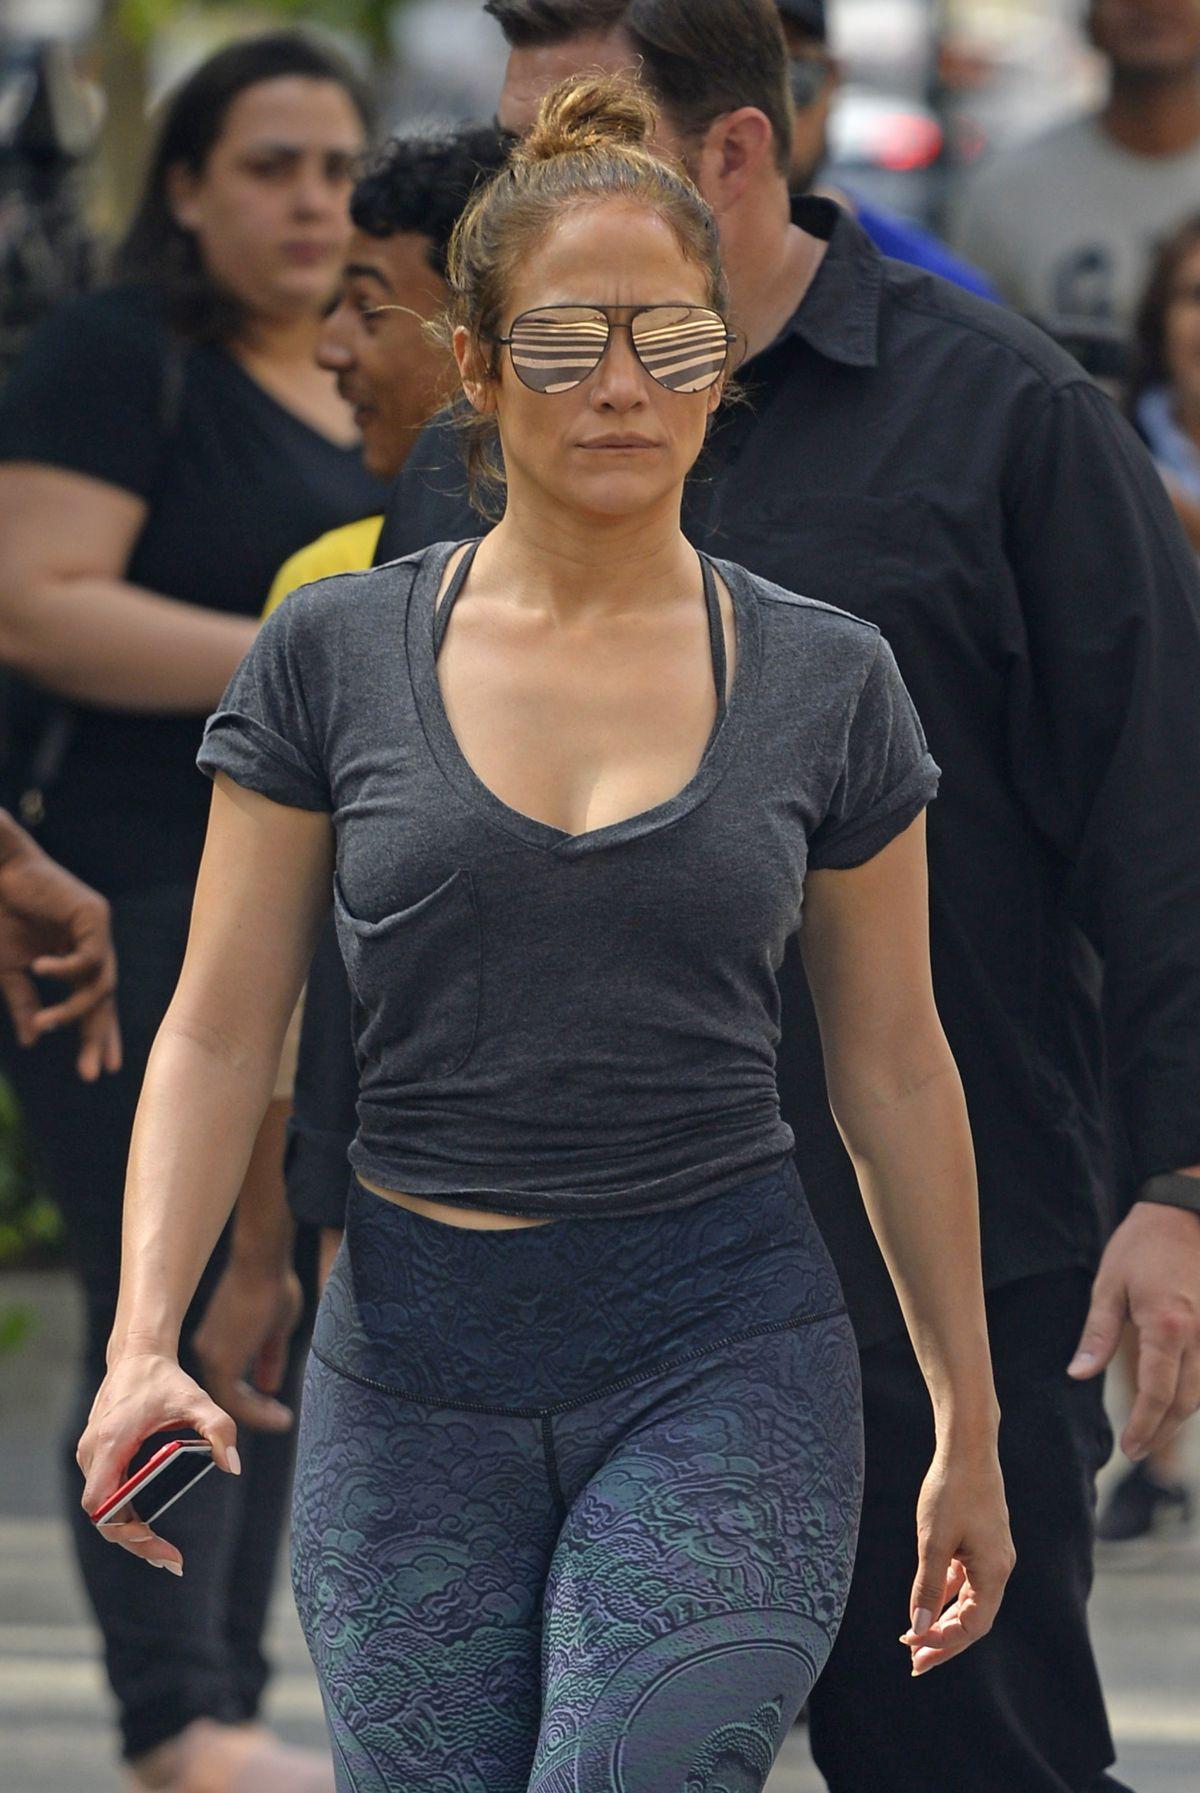 Jennifer Lopez Heading To A Gym In New York 09 26 2017